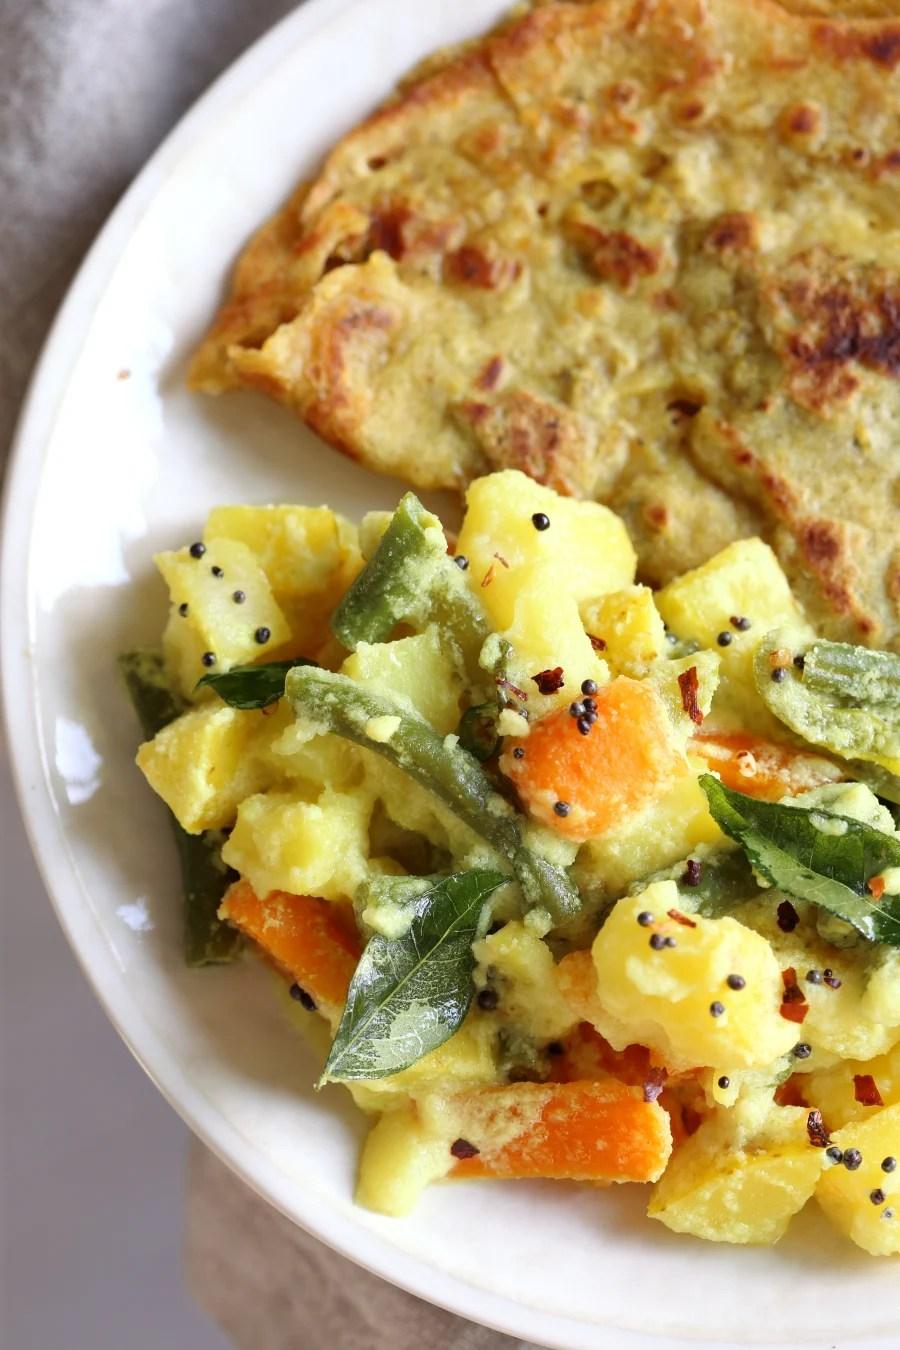 Avial - South Indian Veggie Coconut Curry. Seasonal Vegetables in easy spiced coconut sauce. Serve over rice, flatbread or dosa crepes. #Vegan #Indian #Glutenfree #Soyfree #Recipe #VeganRicha   VeganRicha.com